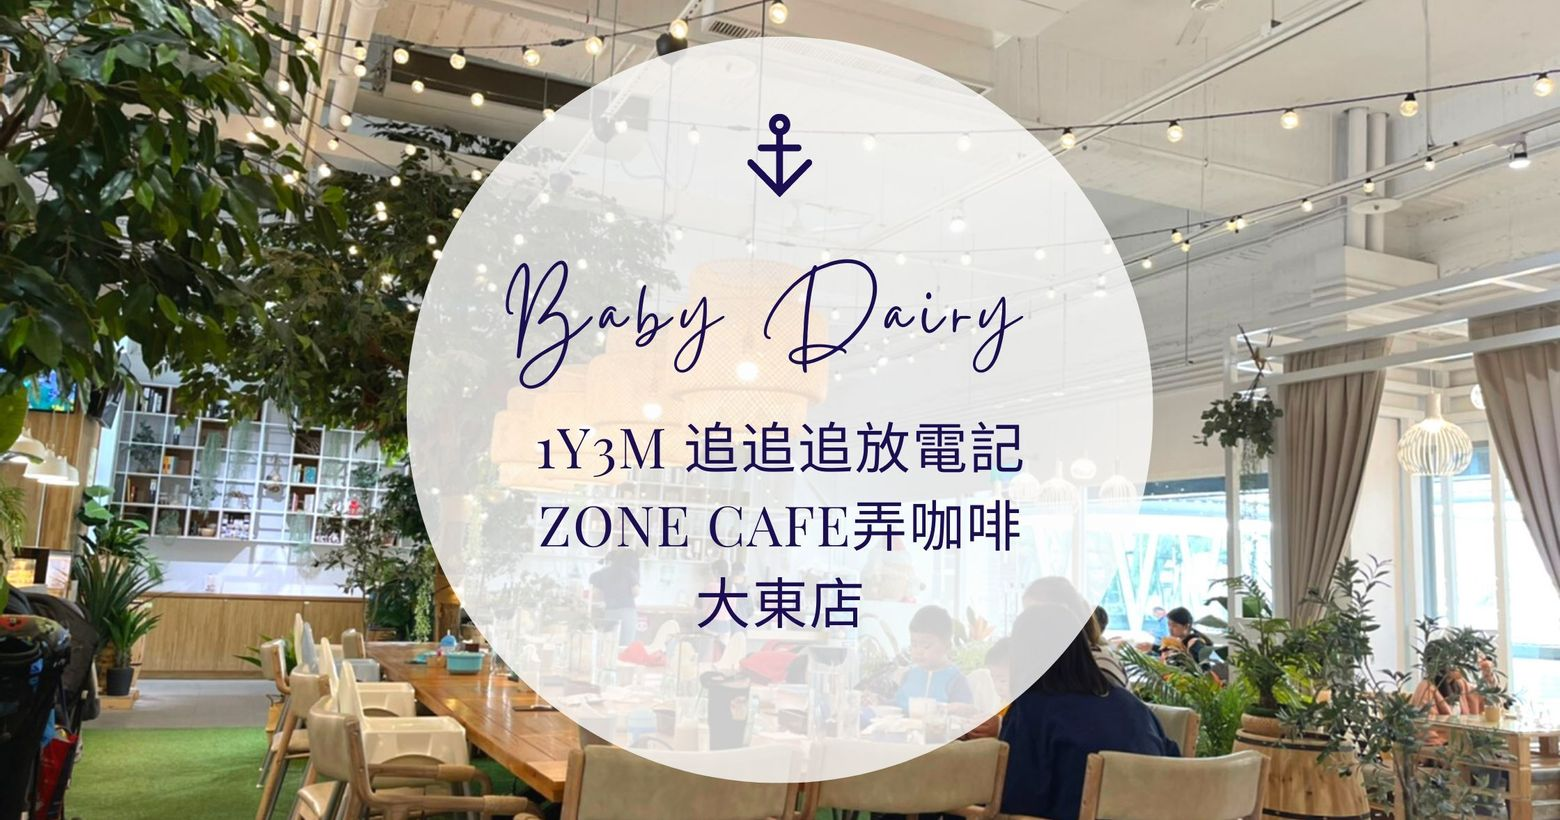 1Y3M追追追放電記 Zone Cafe 弄咖啡大東店這次跟學妹再度來訪親子/網美餐廳-弄咖啡,之前